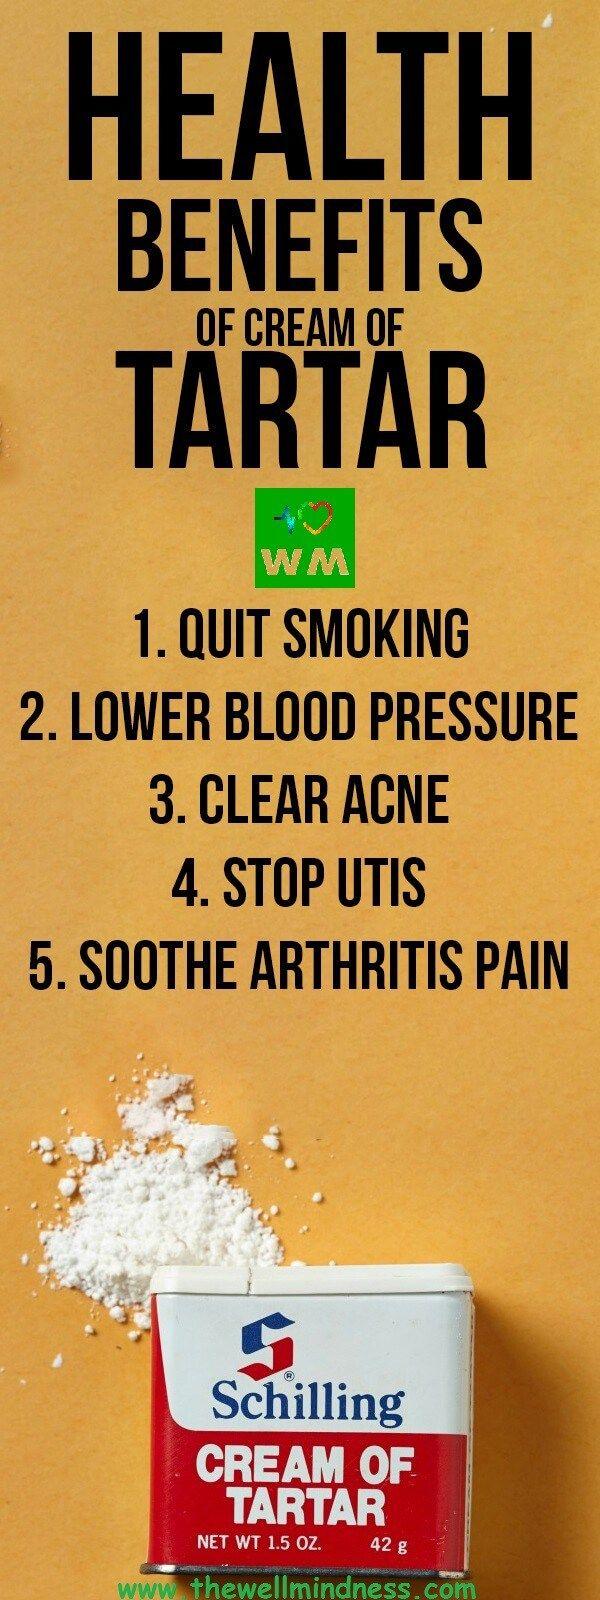 Health Benefits Of Cream Of Tartar - The Wellmindness